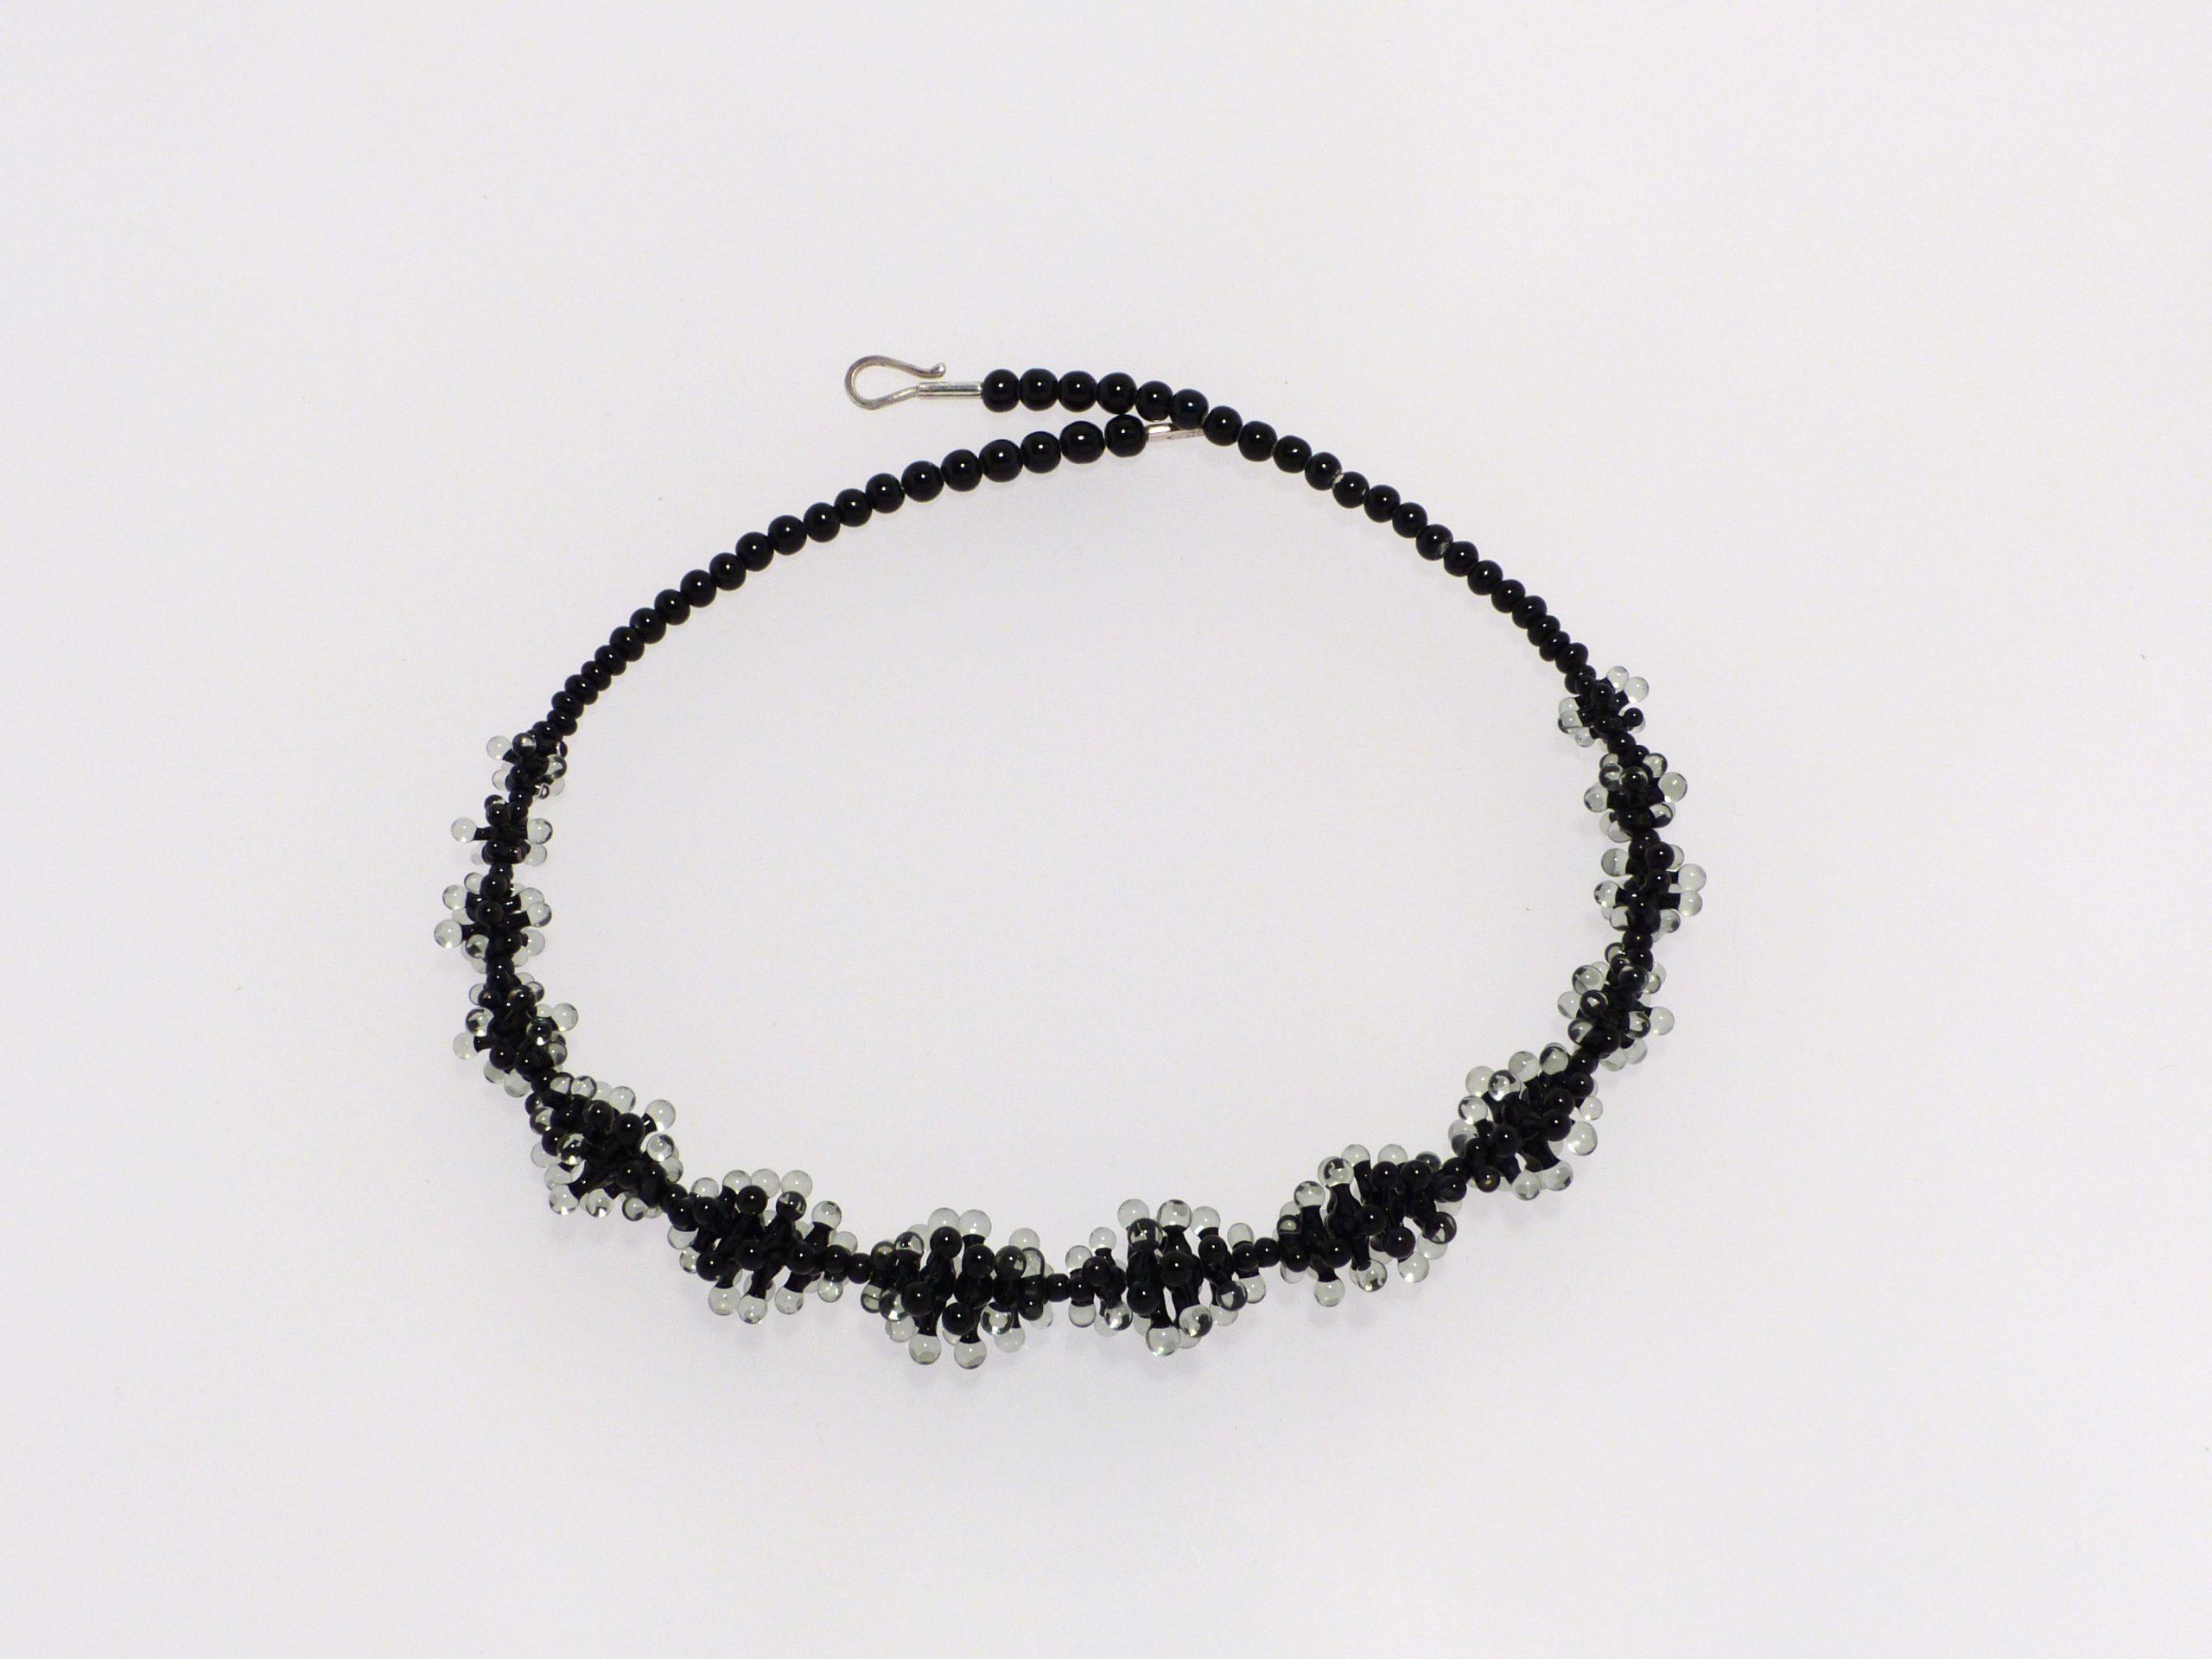 Seeanemone kugelig schwarz- grau |  Glas Stahlseil, Silber | 140993-19